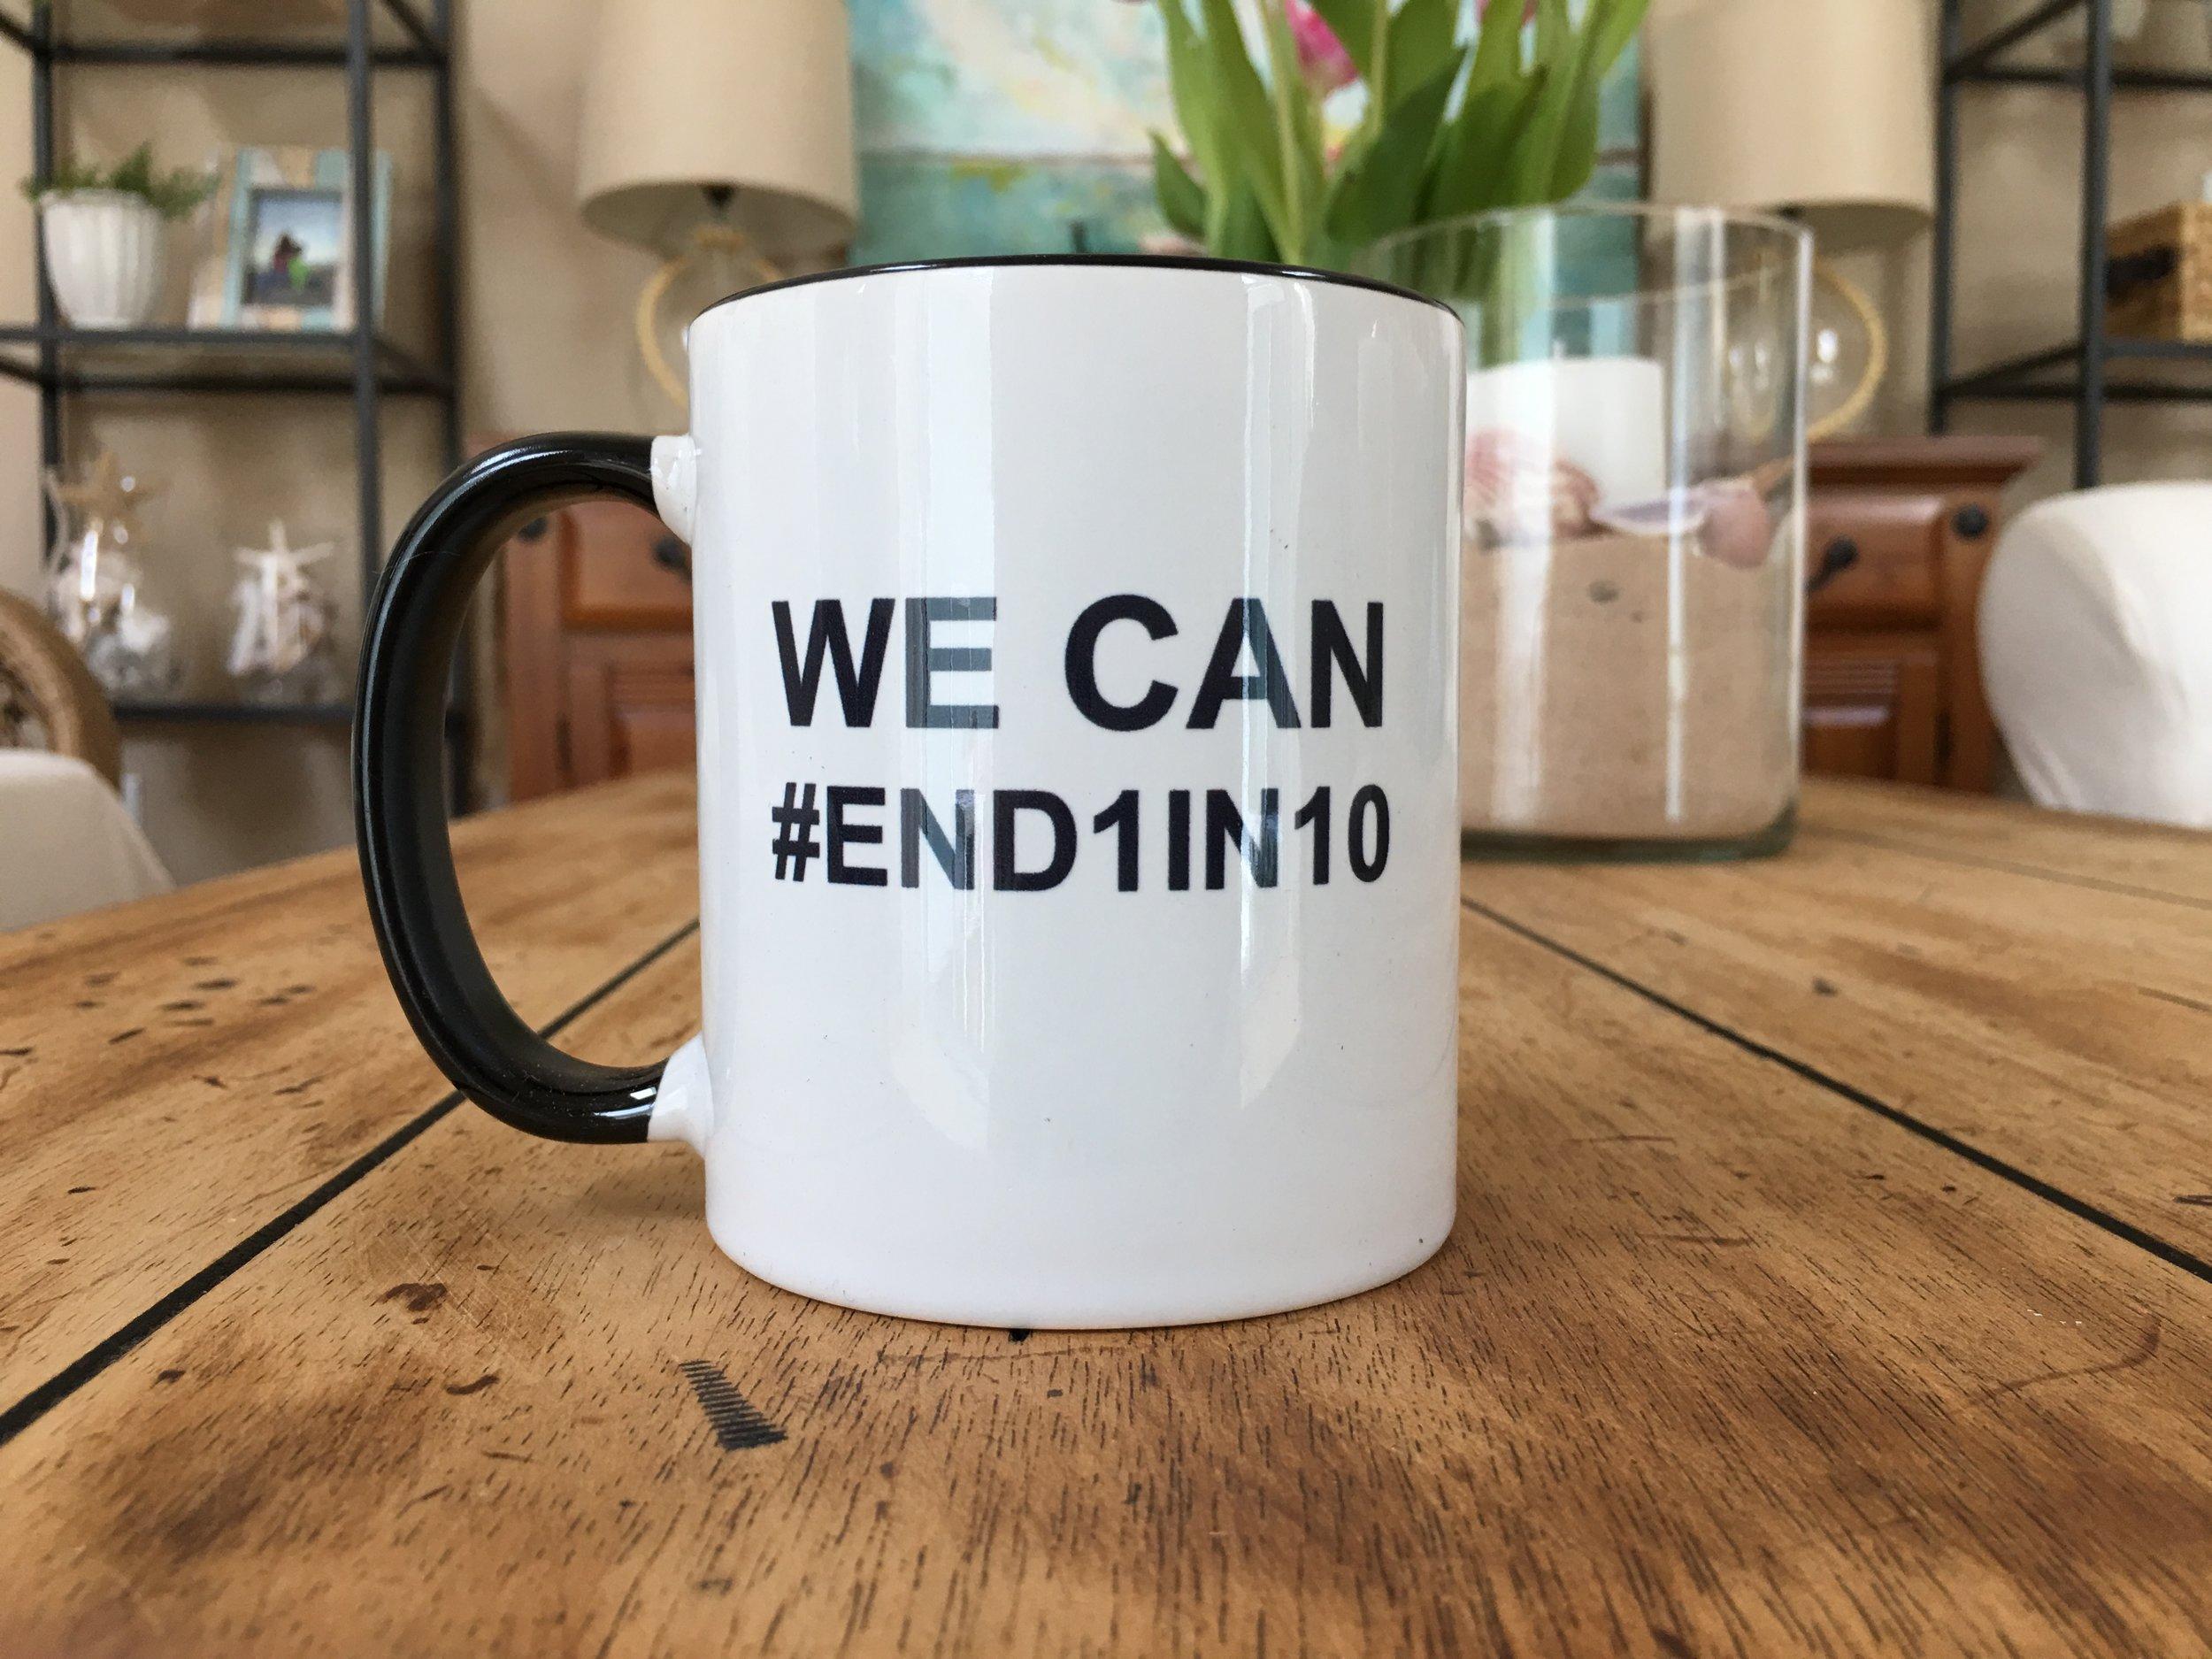 #END1in10 Campaign Mug